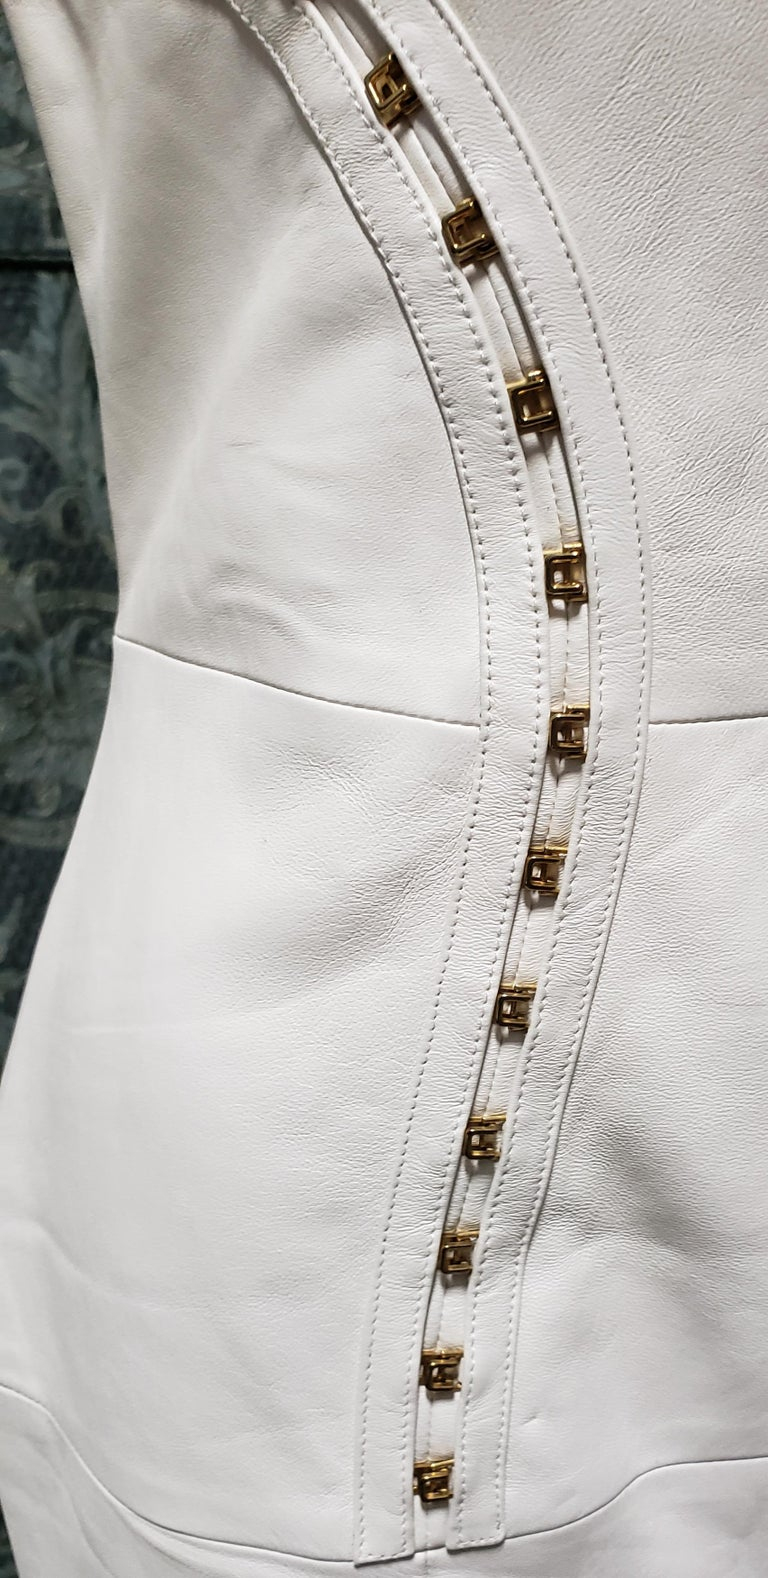 VERSACE OFF WHITE METAL HARDWARE EMBELLISHED LEATHER Dress 44 - 10 For Sale 3